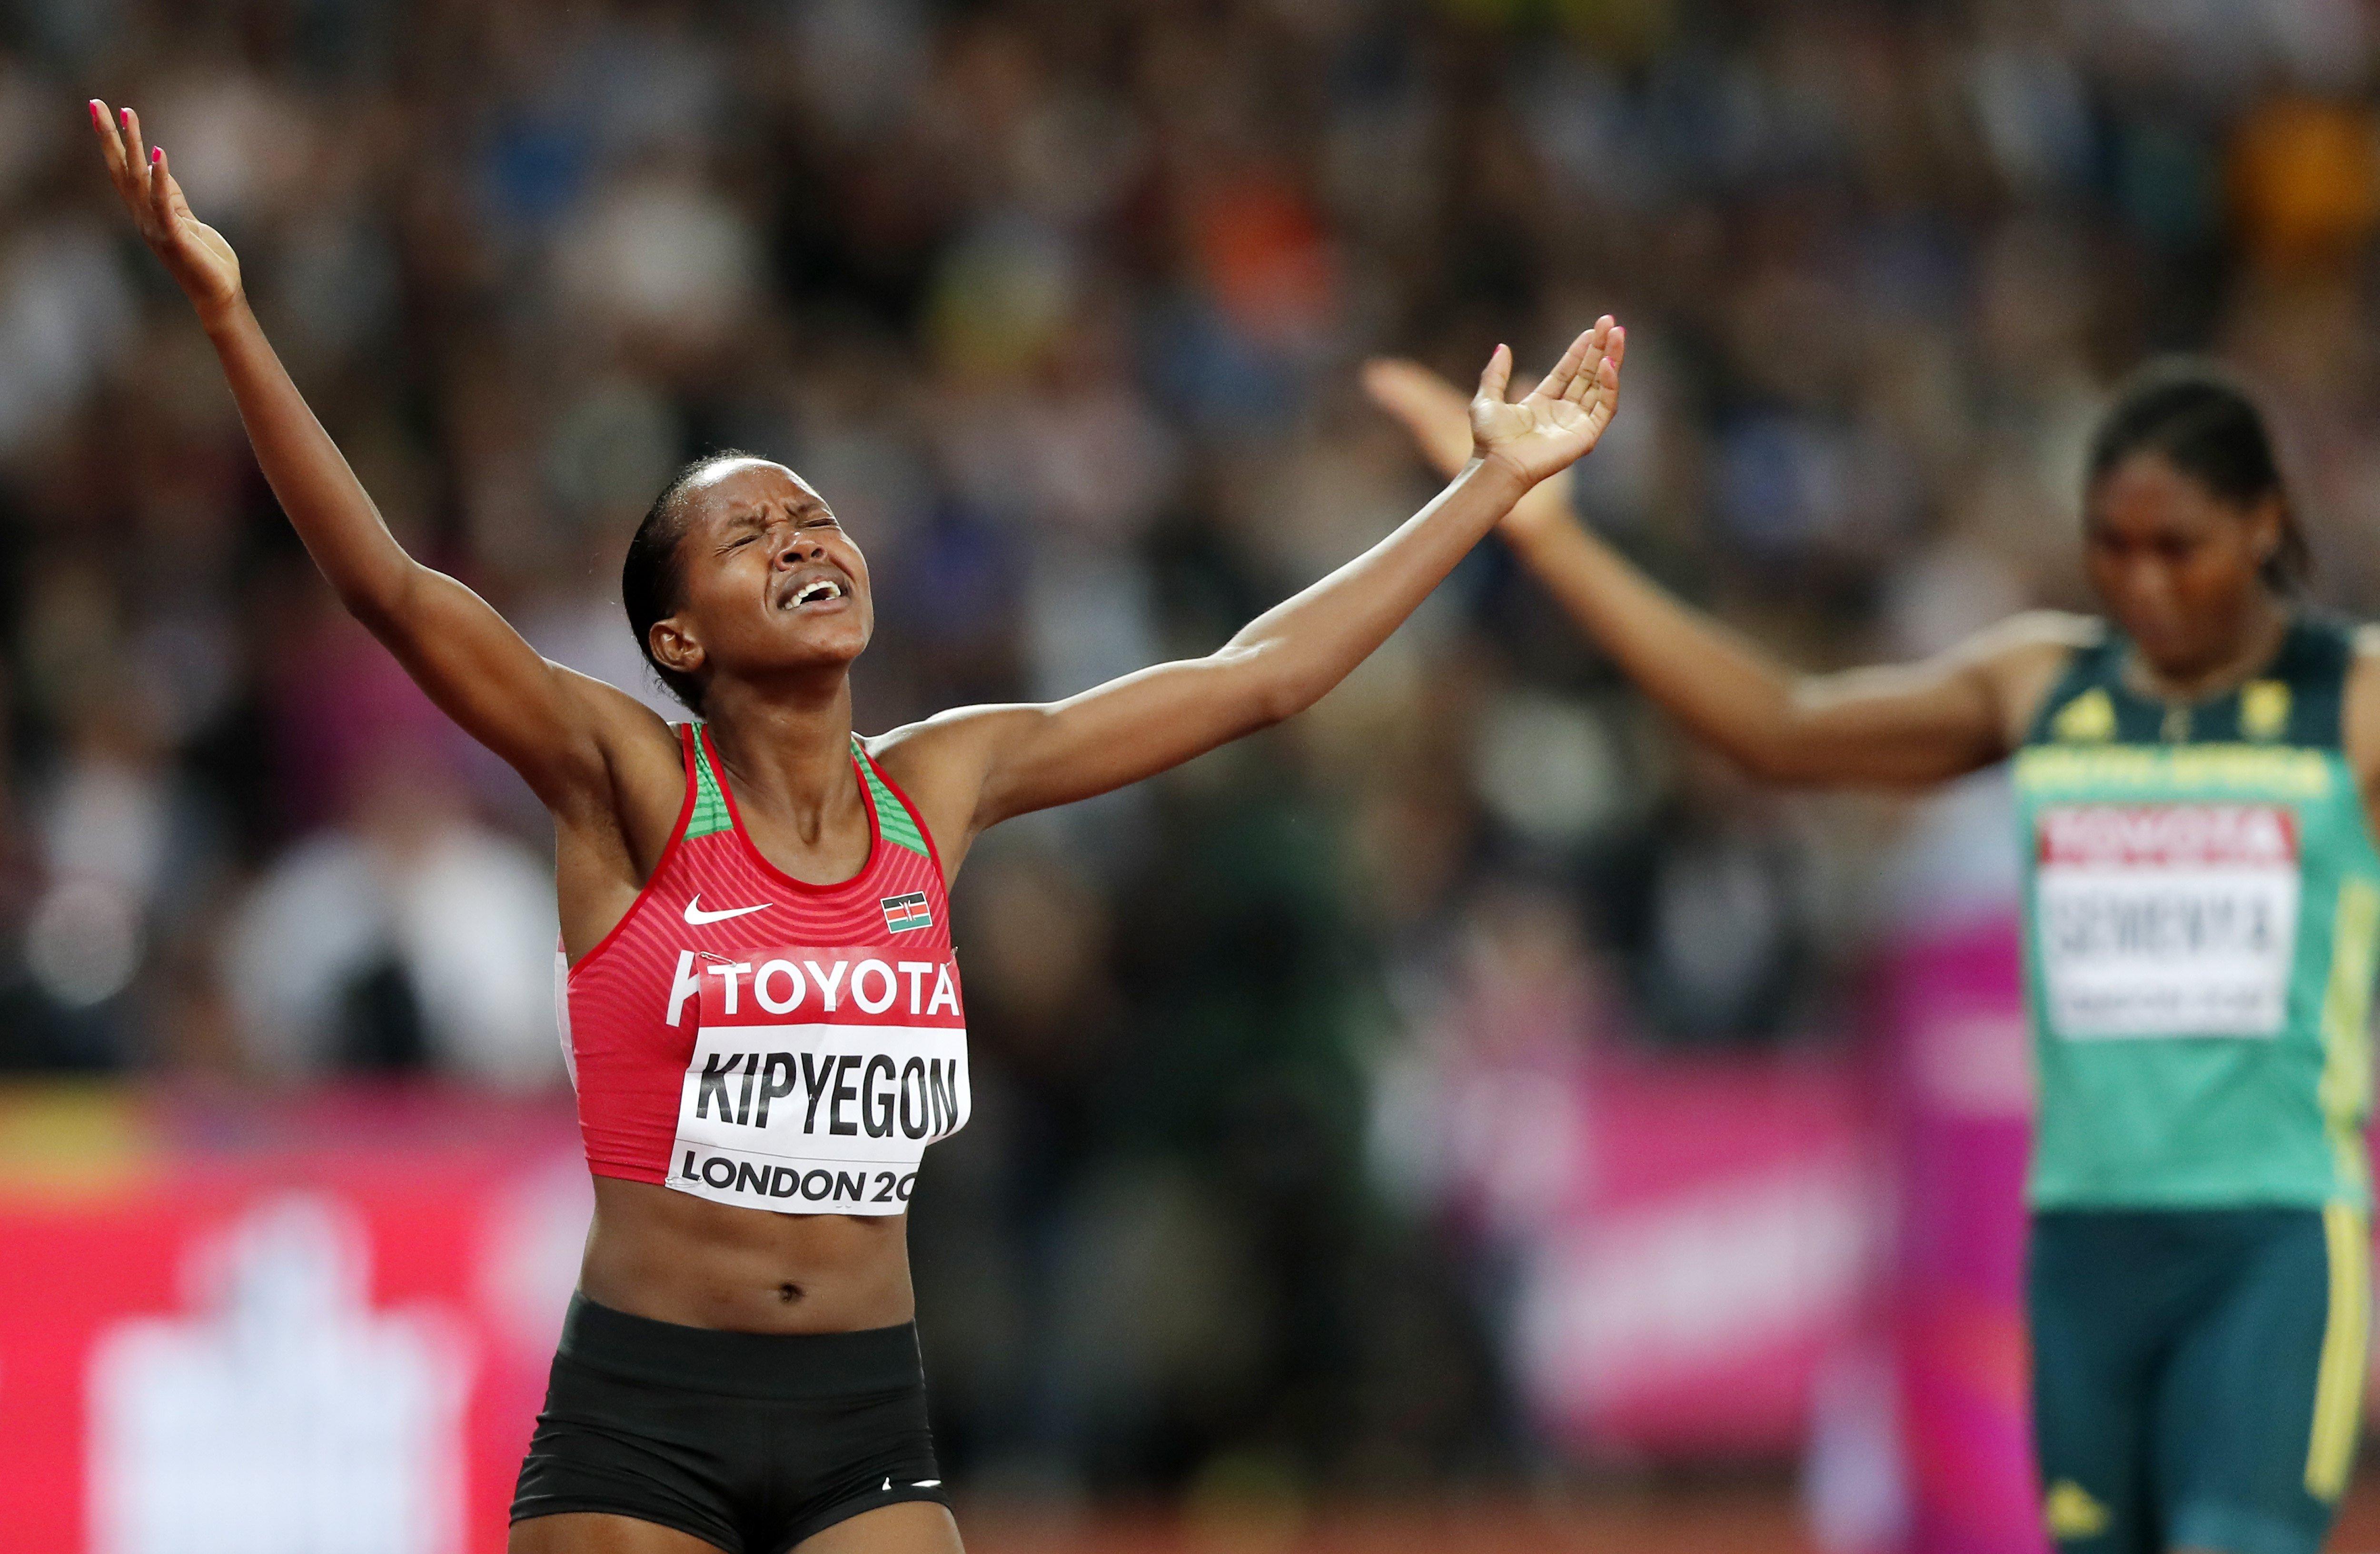 Kipyegon, campiona en el Mundial d'Atletisme. /IAN LANGSDON